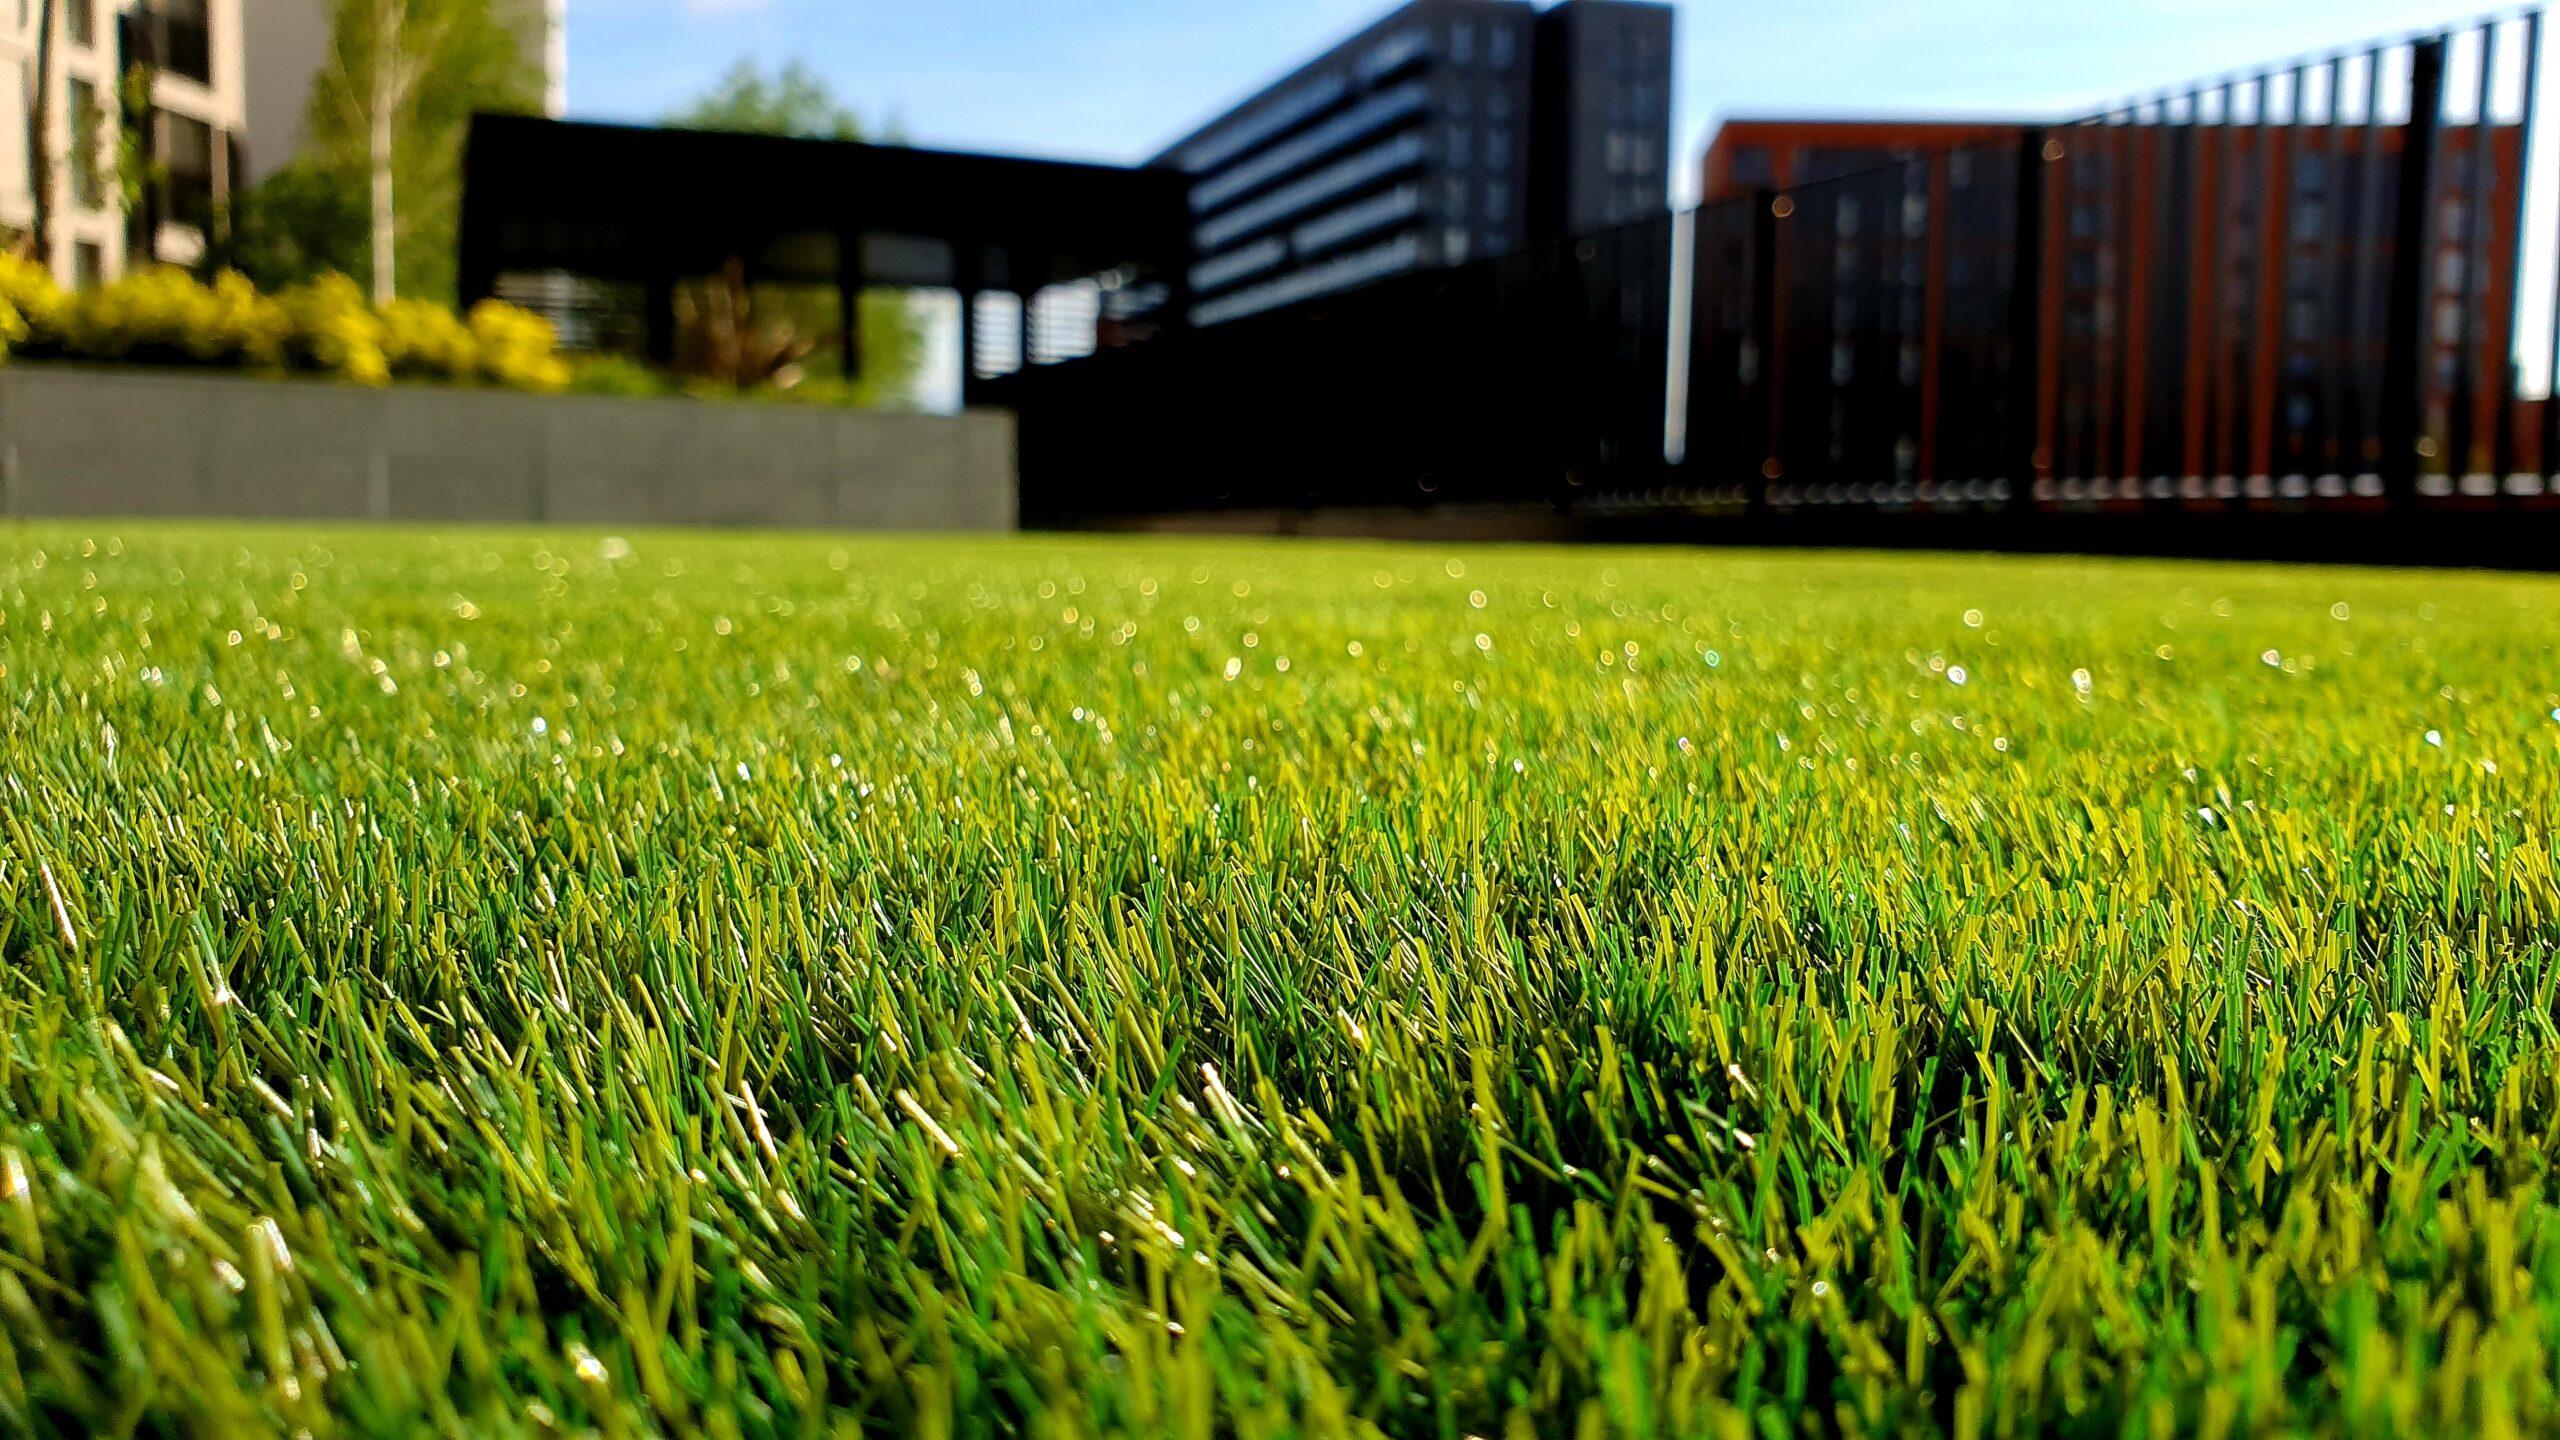 Image shows beautiful green grass